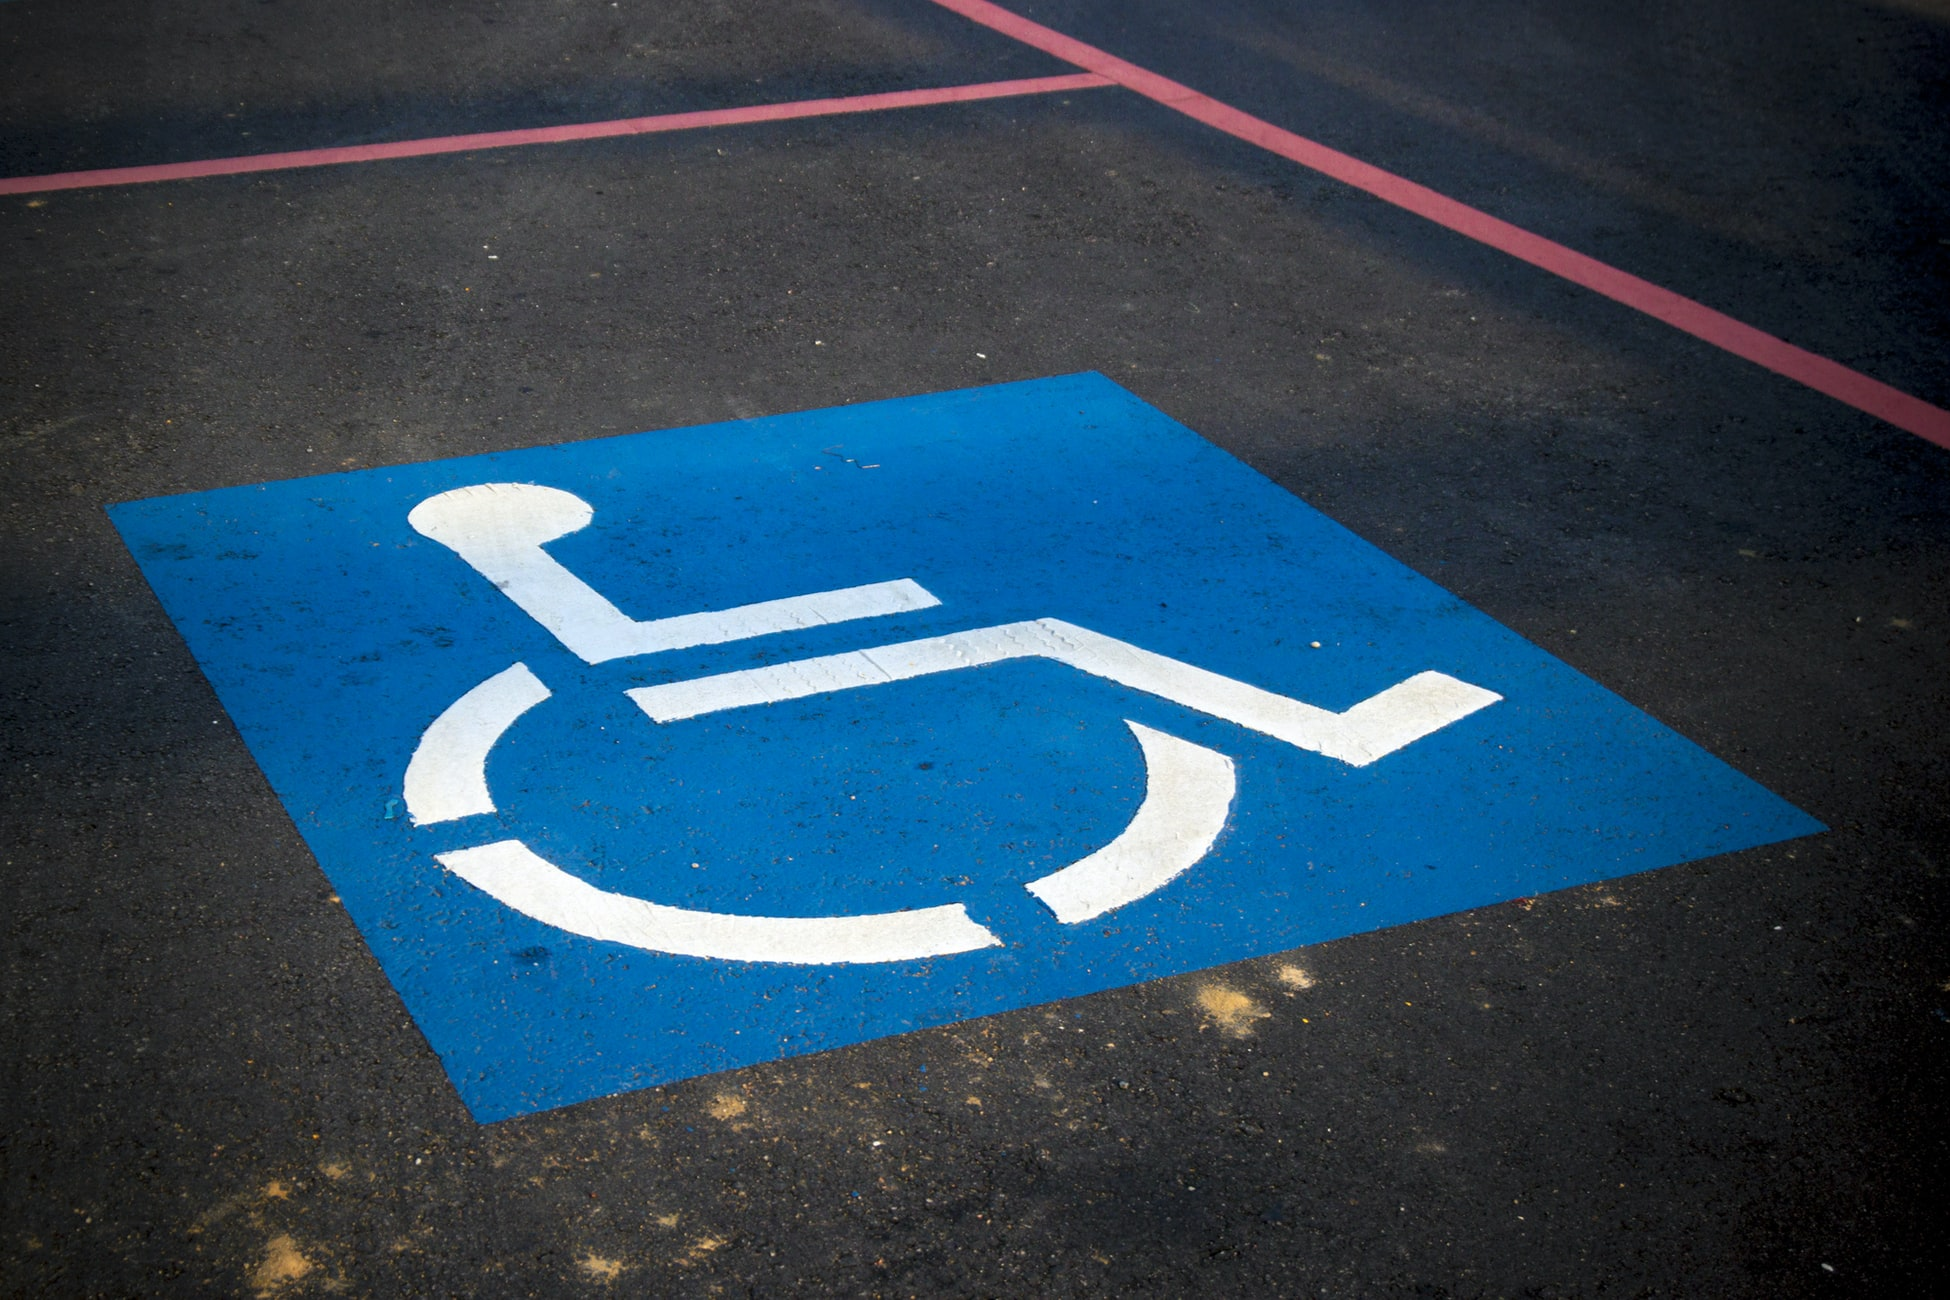 ada accessibility image